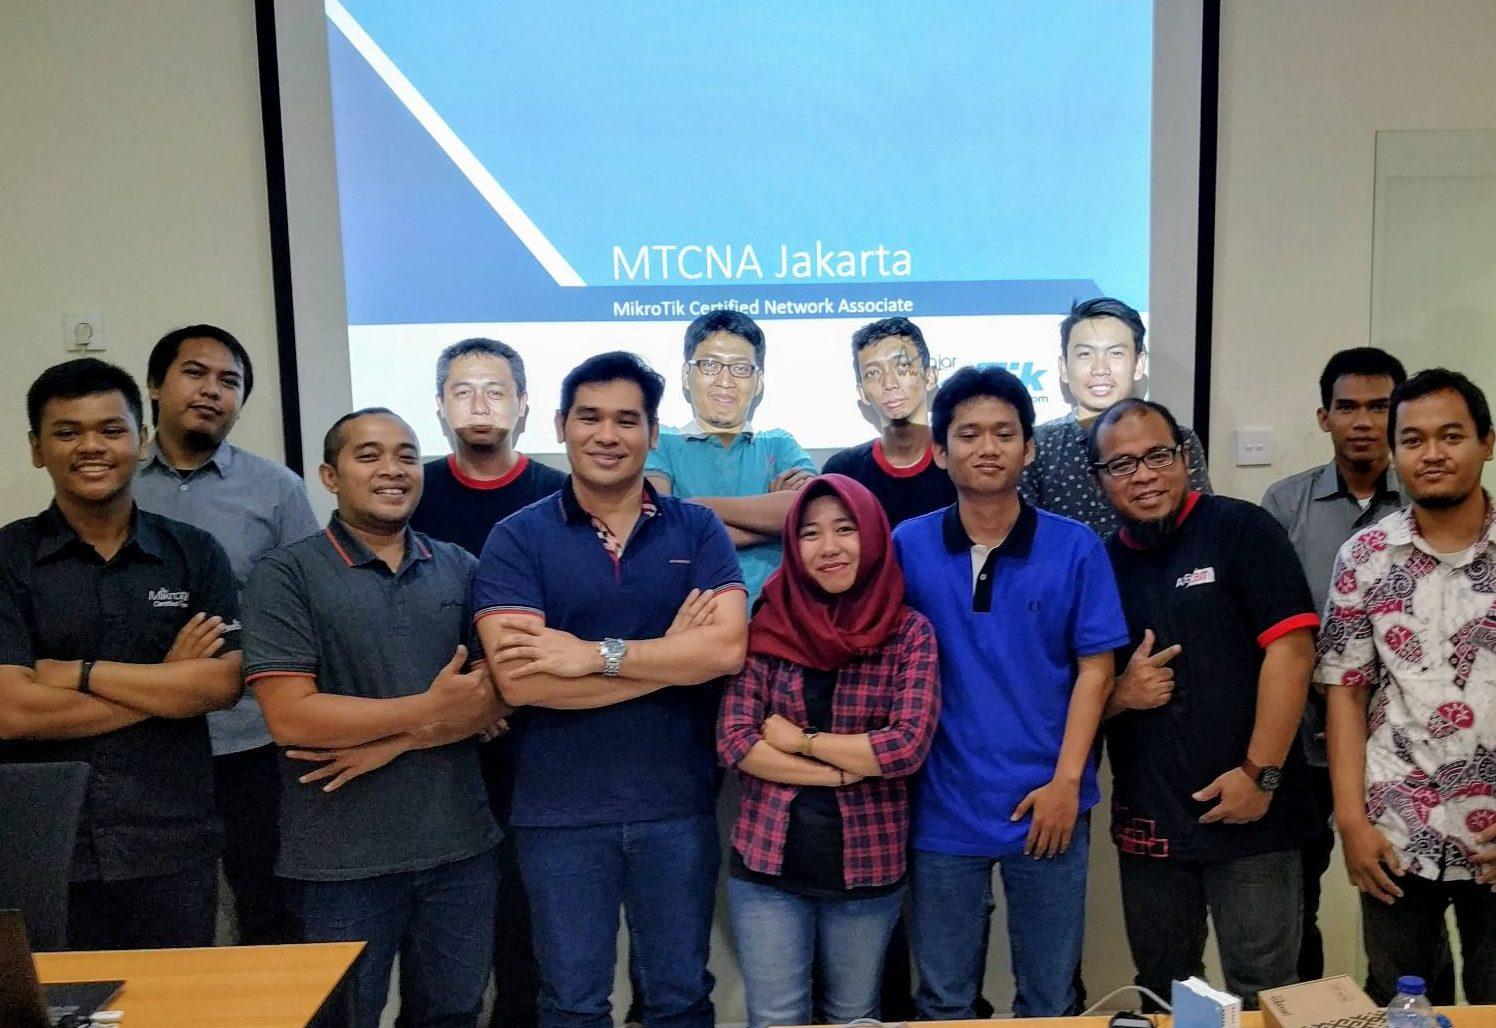 belajar, mikrotik, sertifikasi, training, IMG_20190328_113425~2